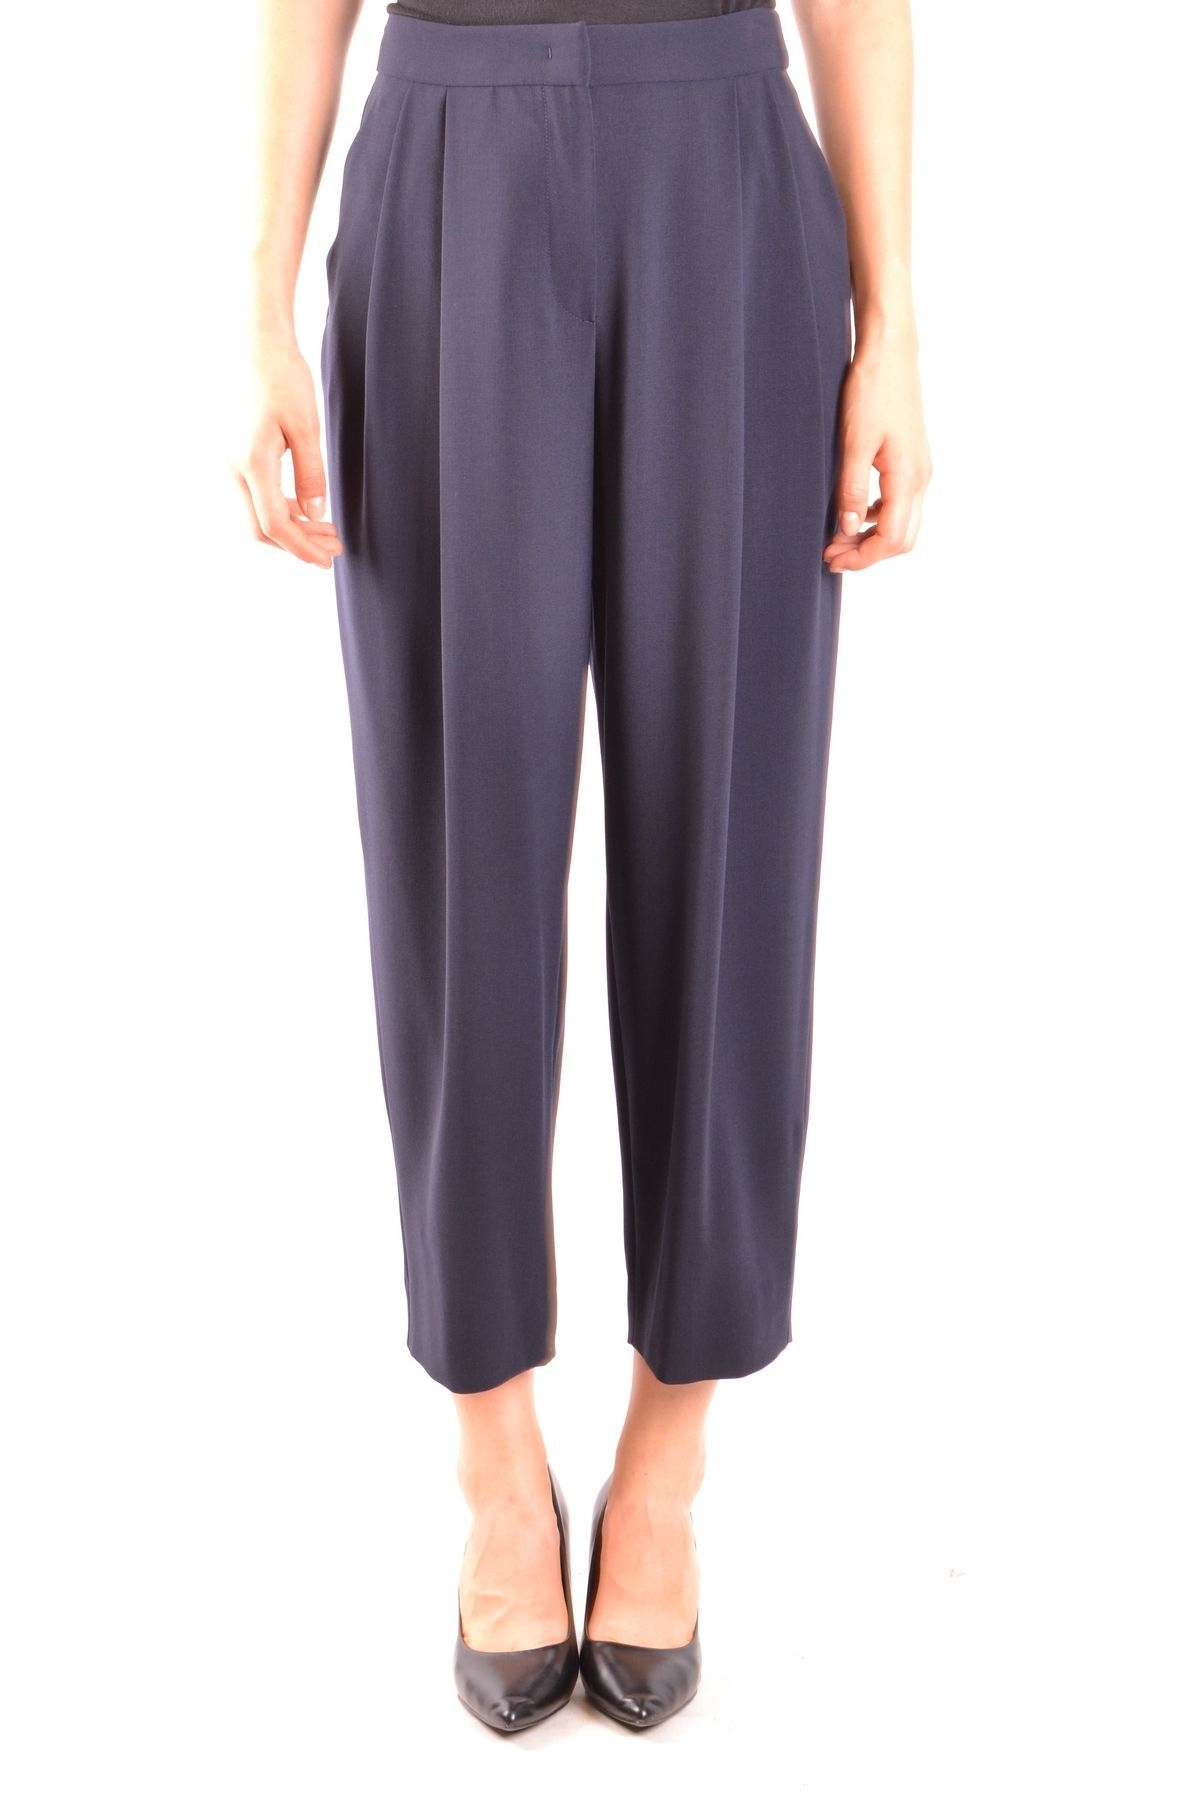 Armani Collezioni Blue Wool Pants